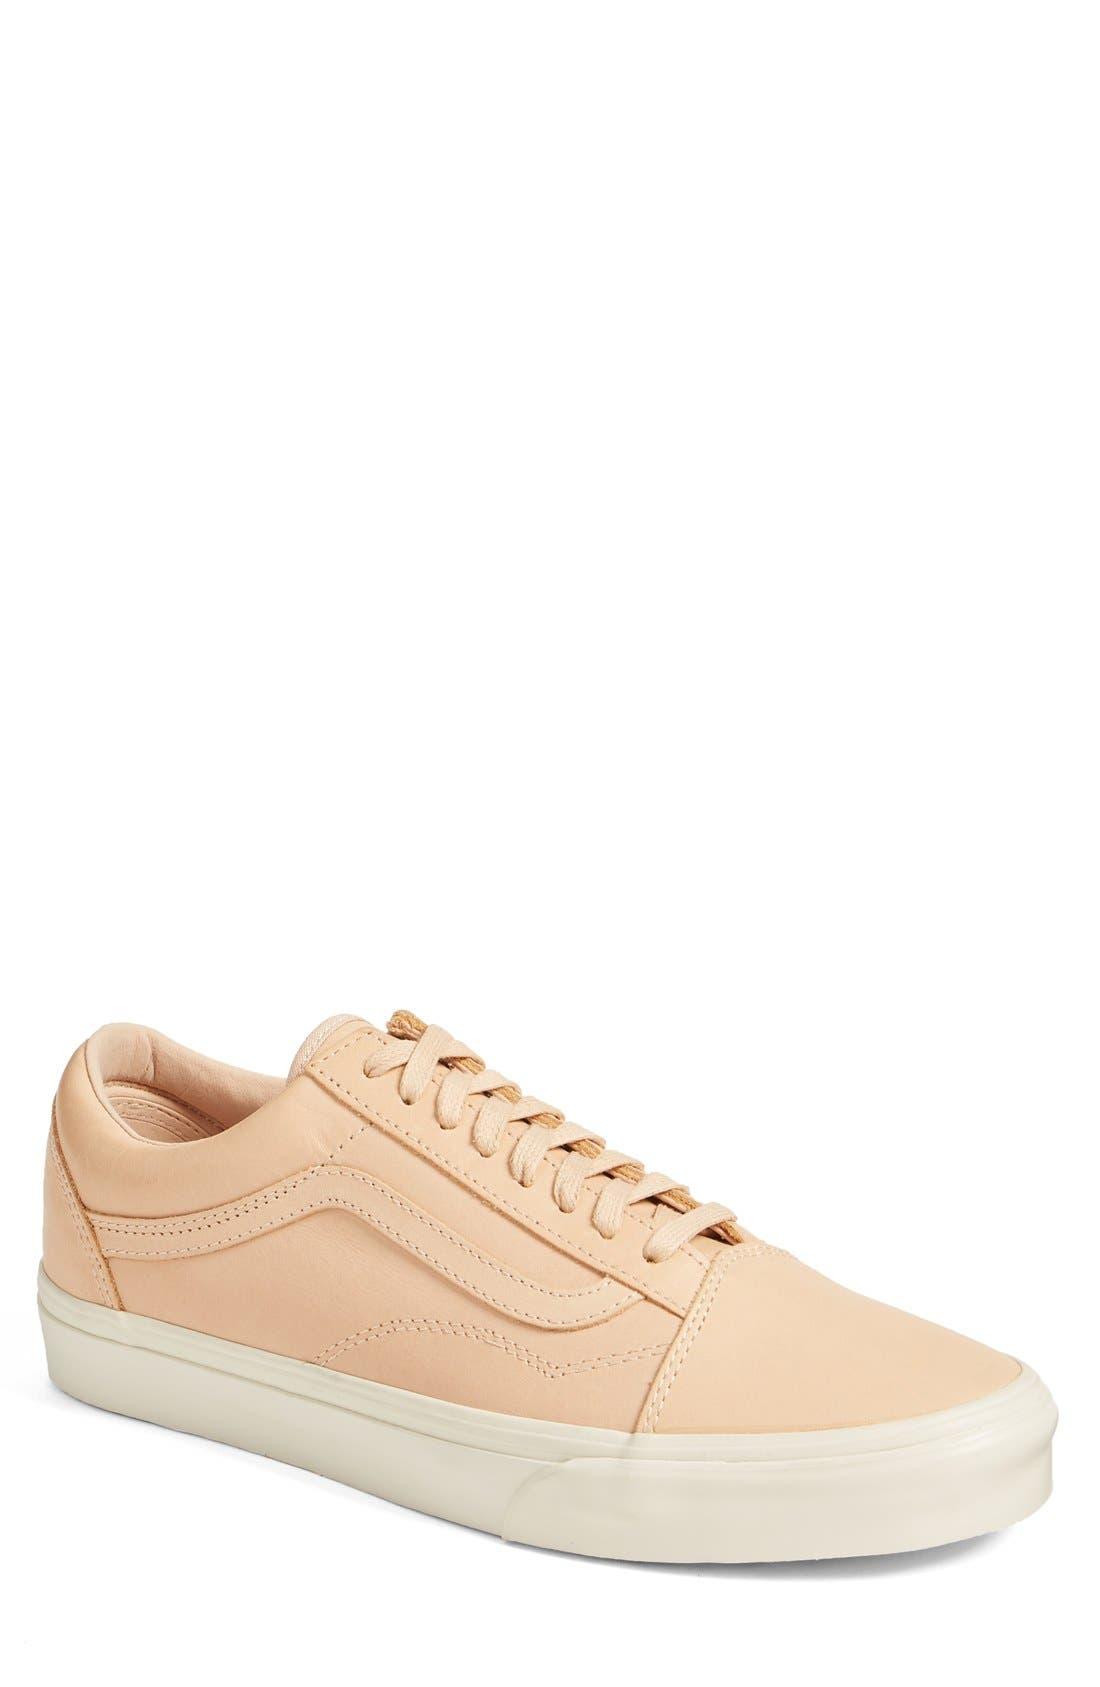 Buy Vans Shoes Near Me